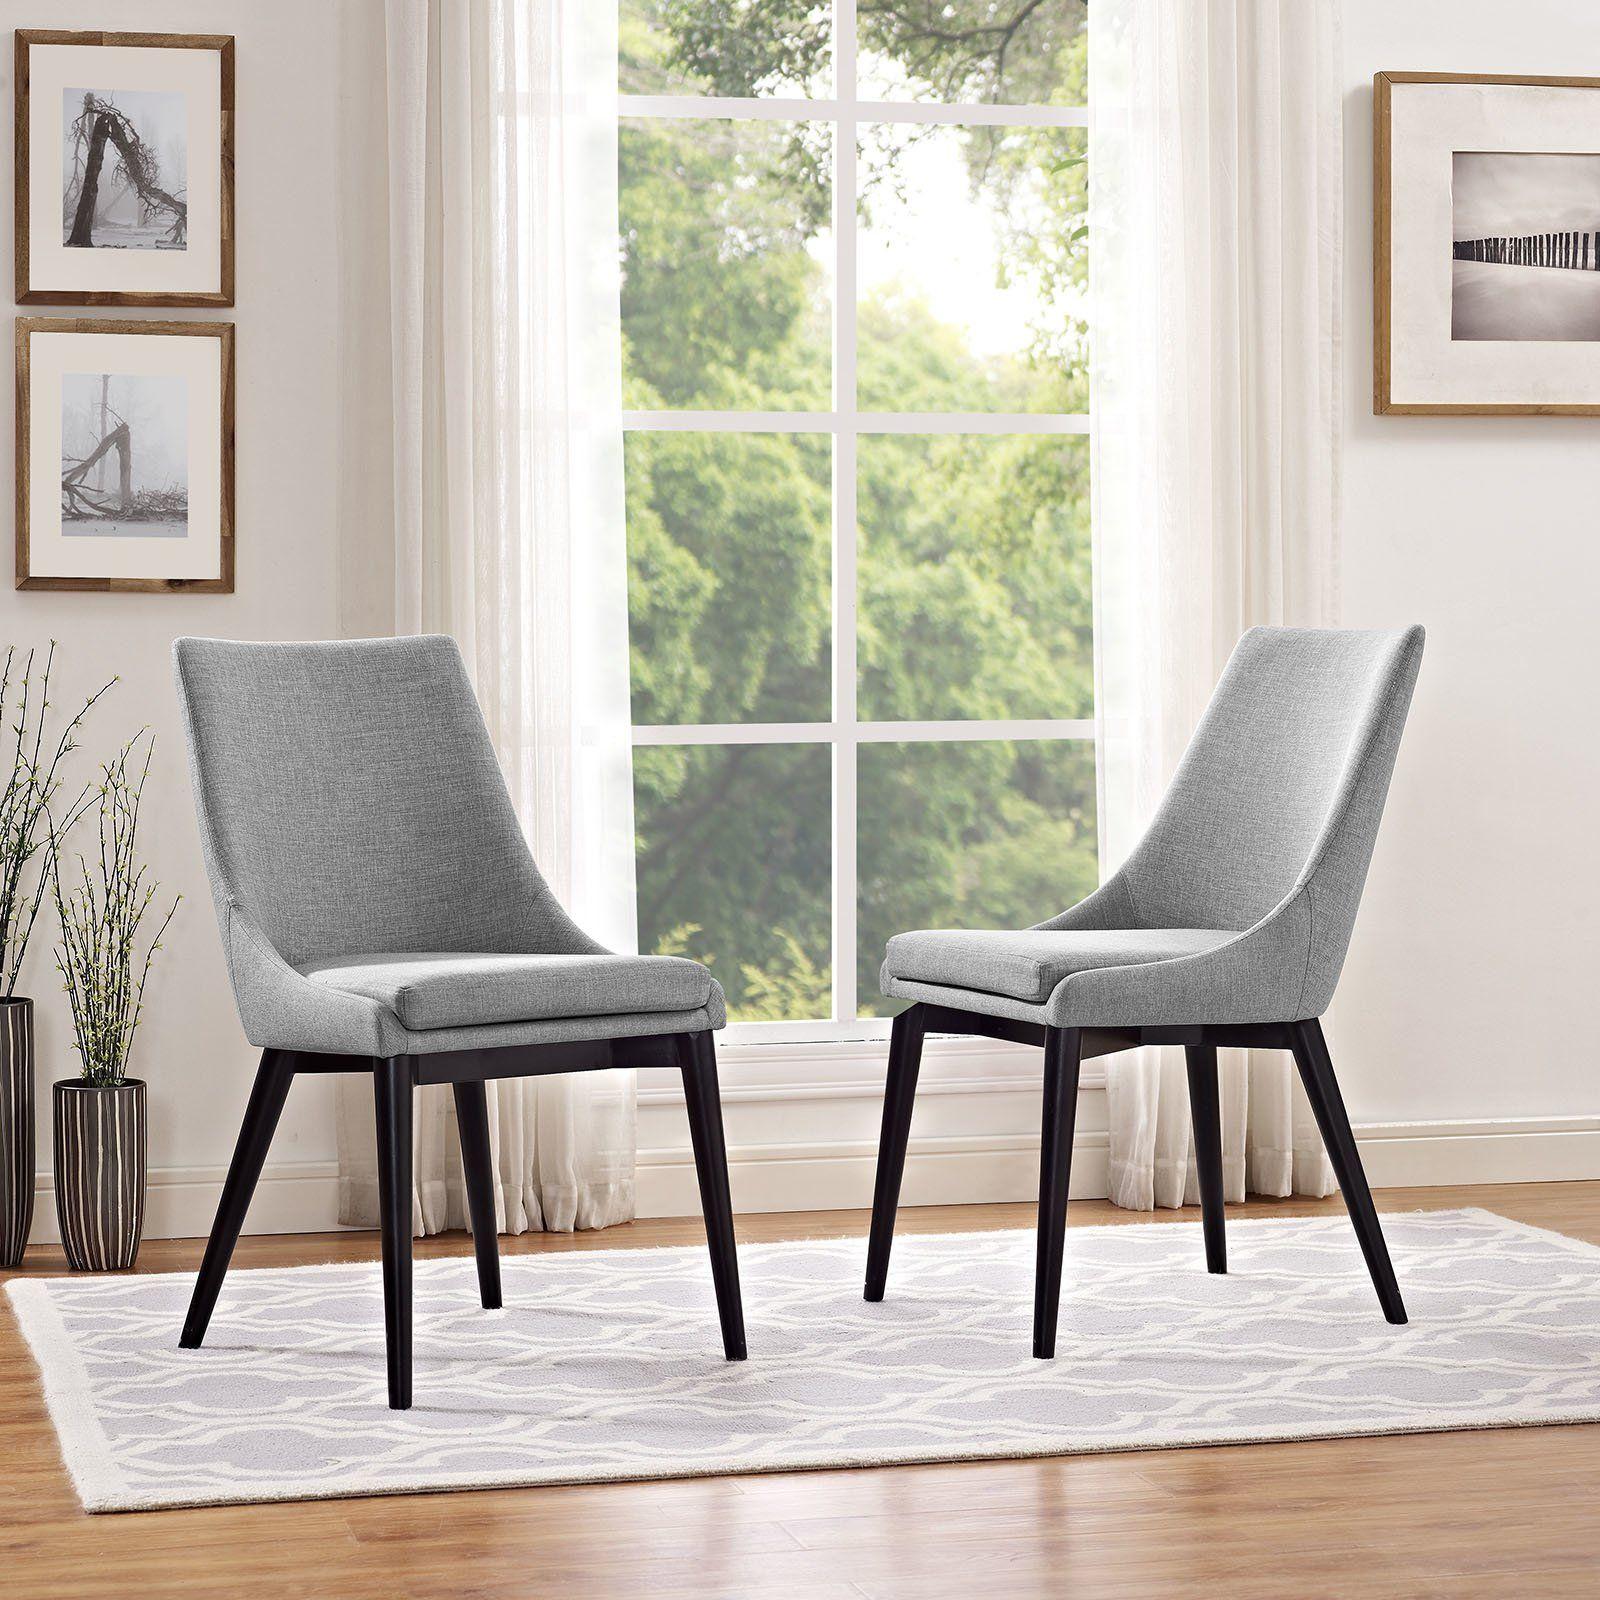 Corrigan Studio Carlton Wood Leg Upholstered Dining Chair Intended For Carlton Wood Leg Upholstered Dining Chairs (View 3 of 15)